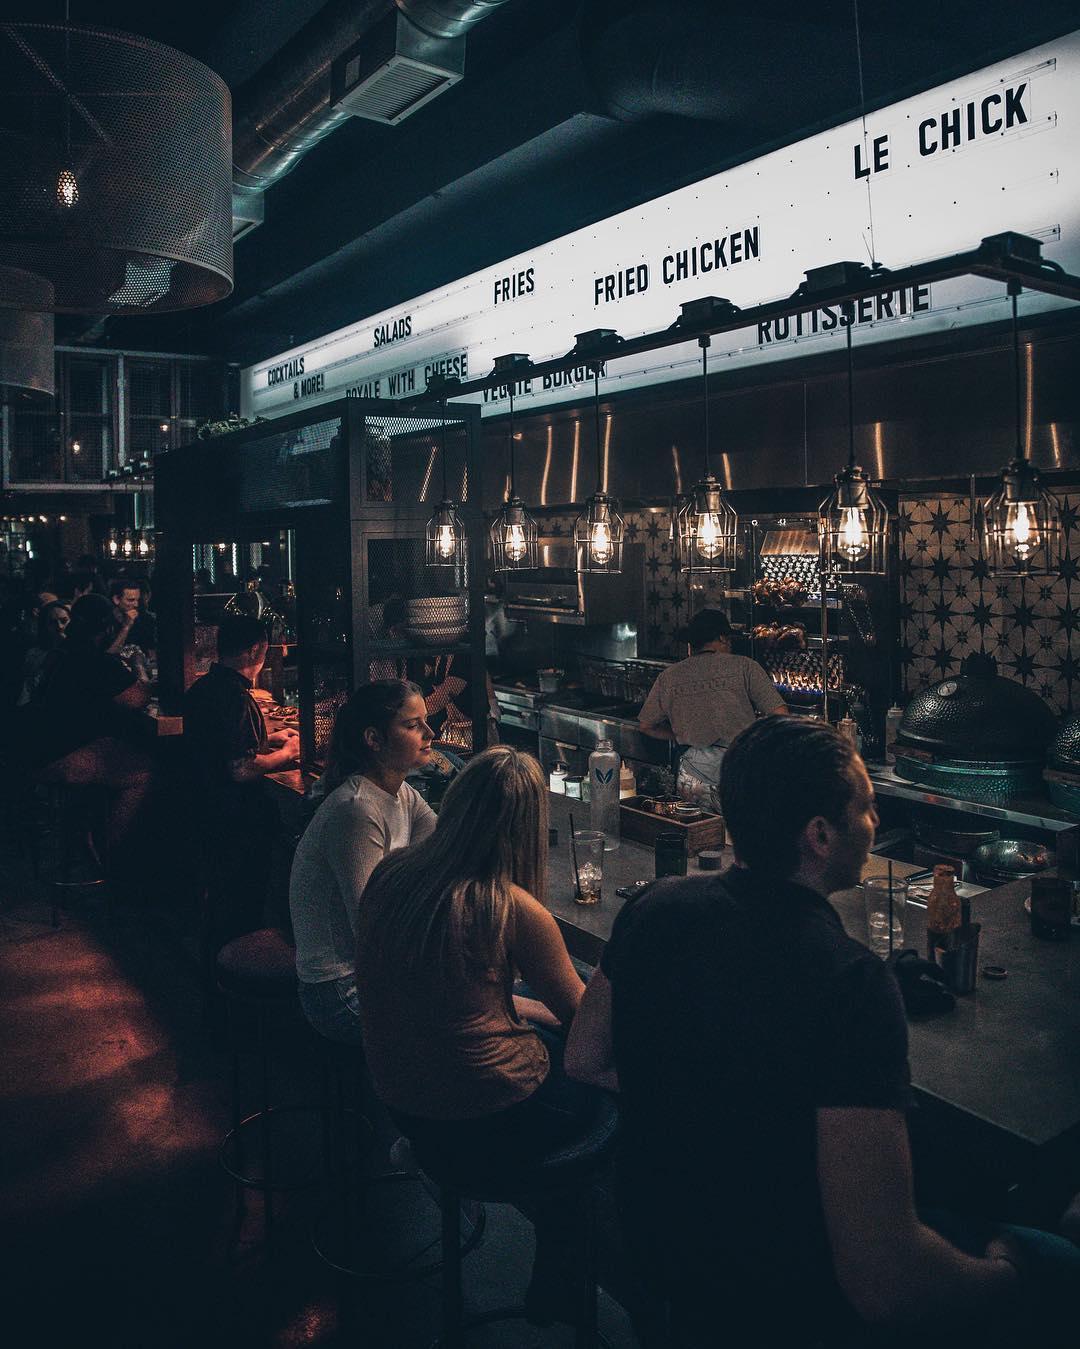 Take a Restaurant and Bar Crawl of Wynwood This Weekend